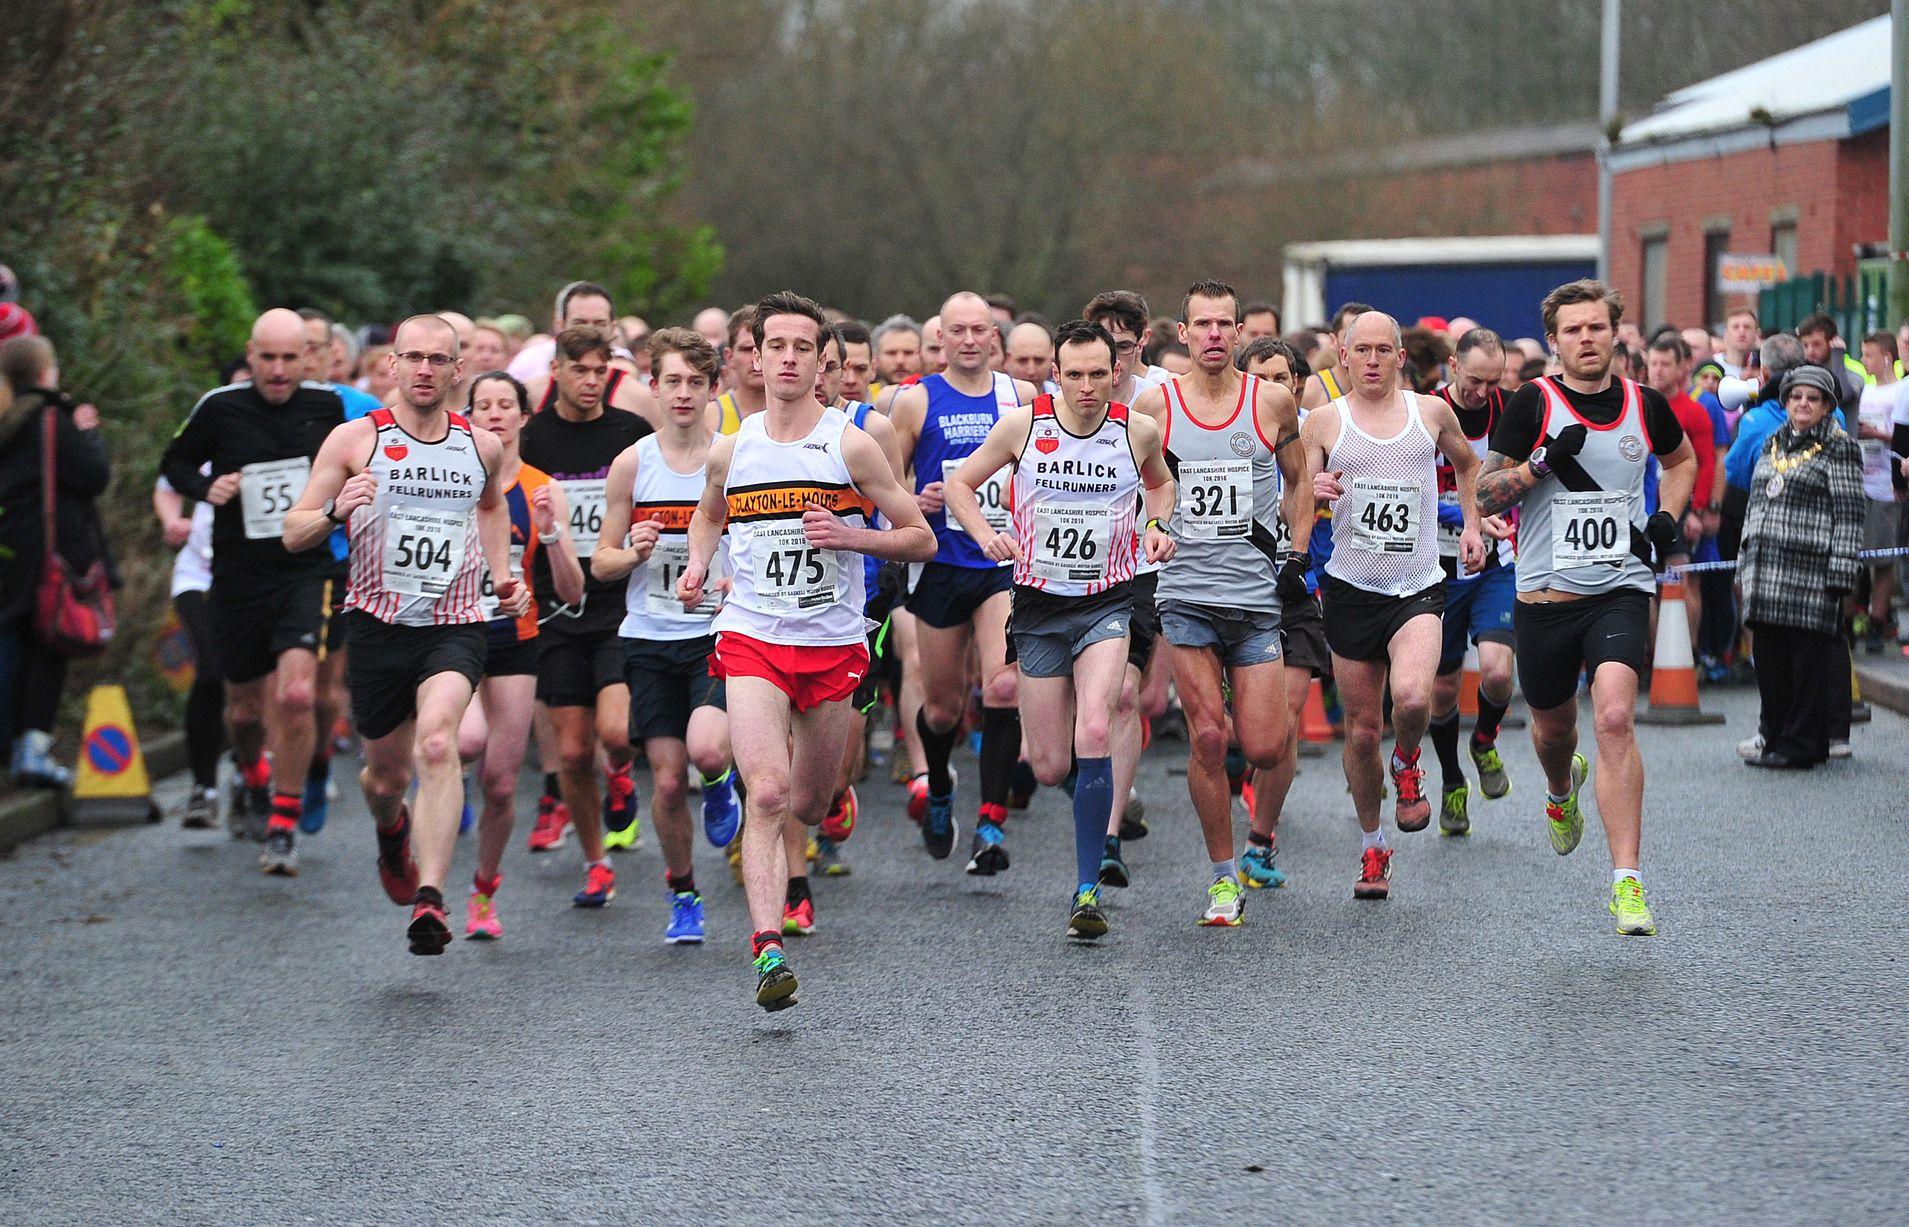 East Lancs Hospice 10k & Park Run Results